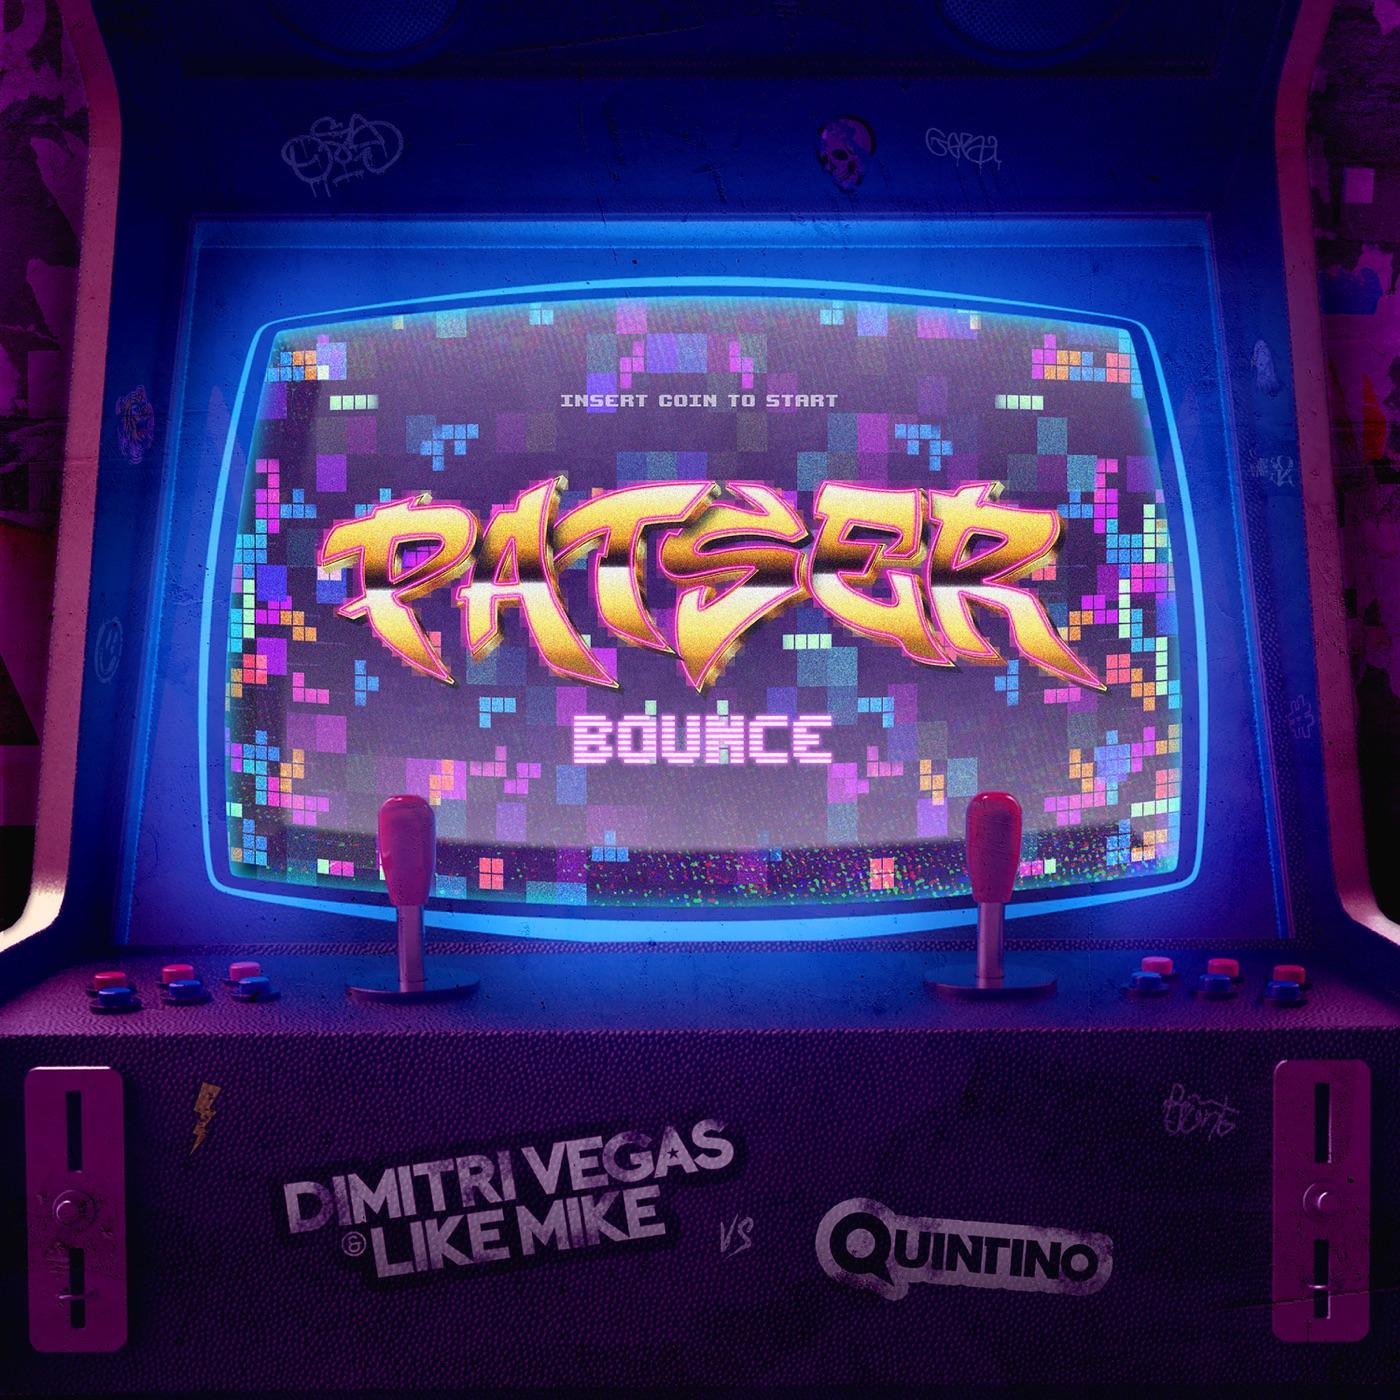 Dimitri Vegas & Like Mike & Quintino - Patser Bounce - Single Cover